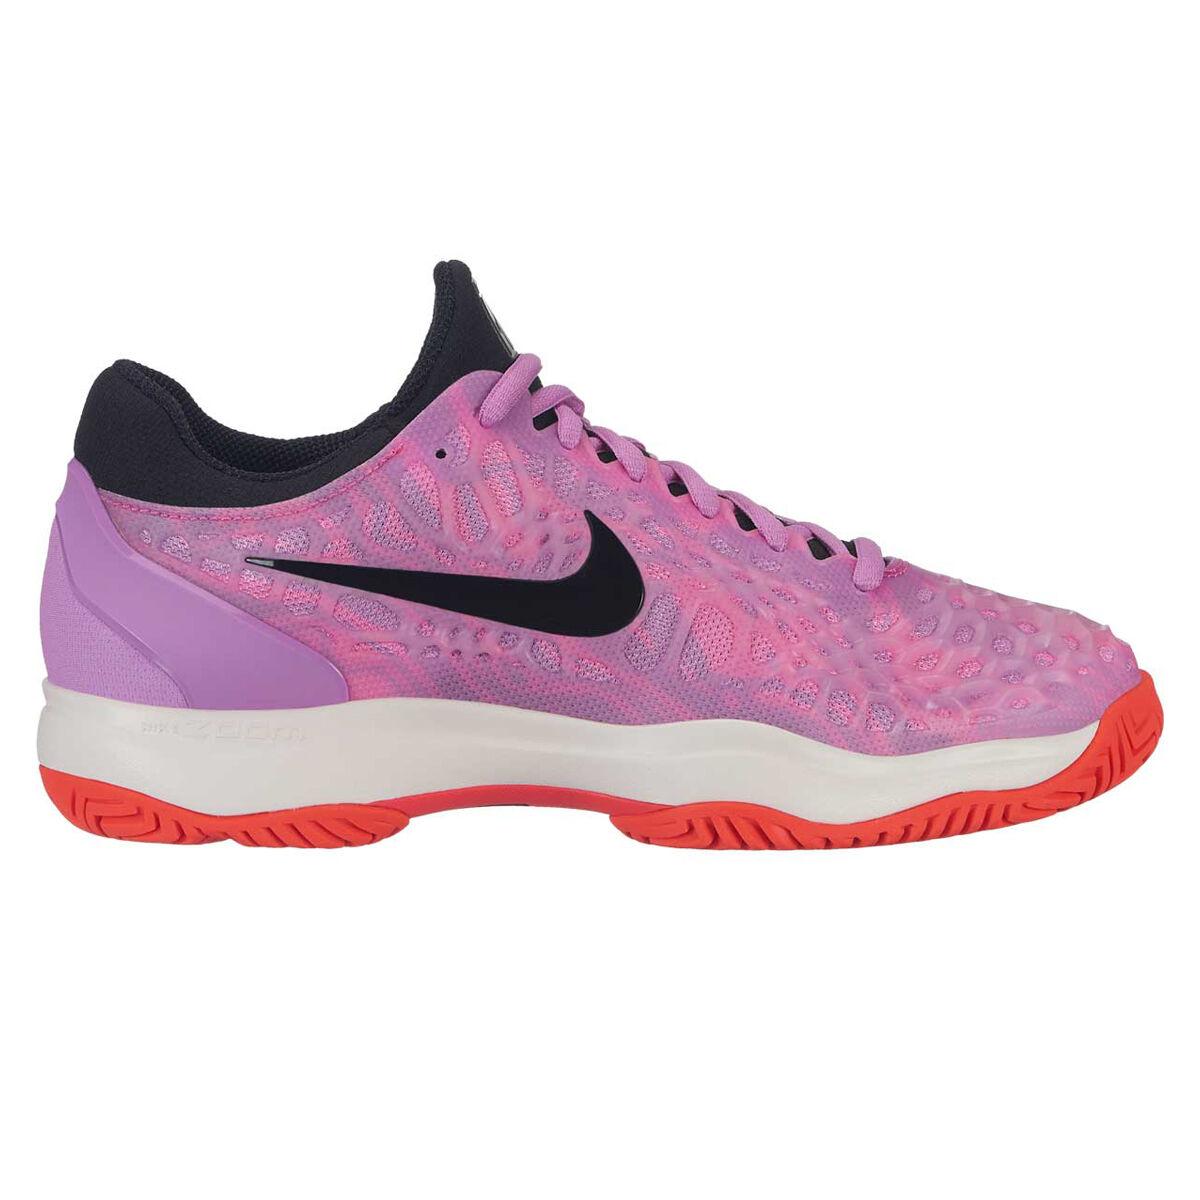 Nike Air Zoom Cage 3 Womens Tennis